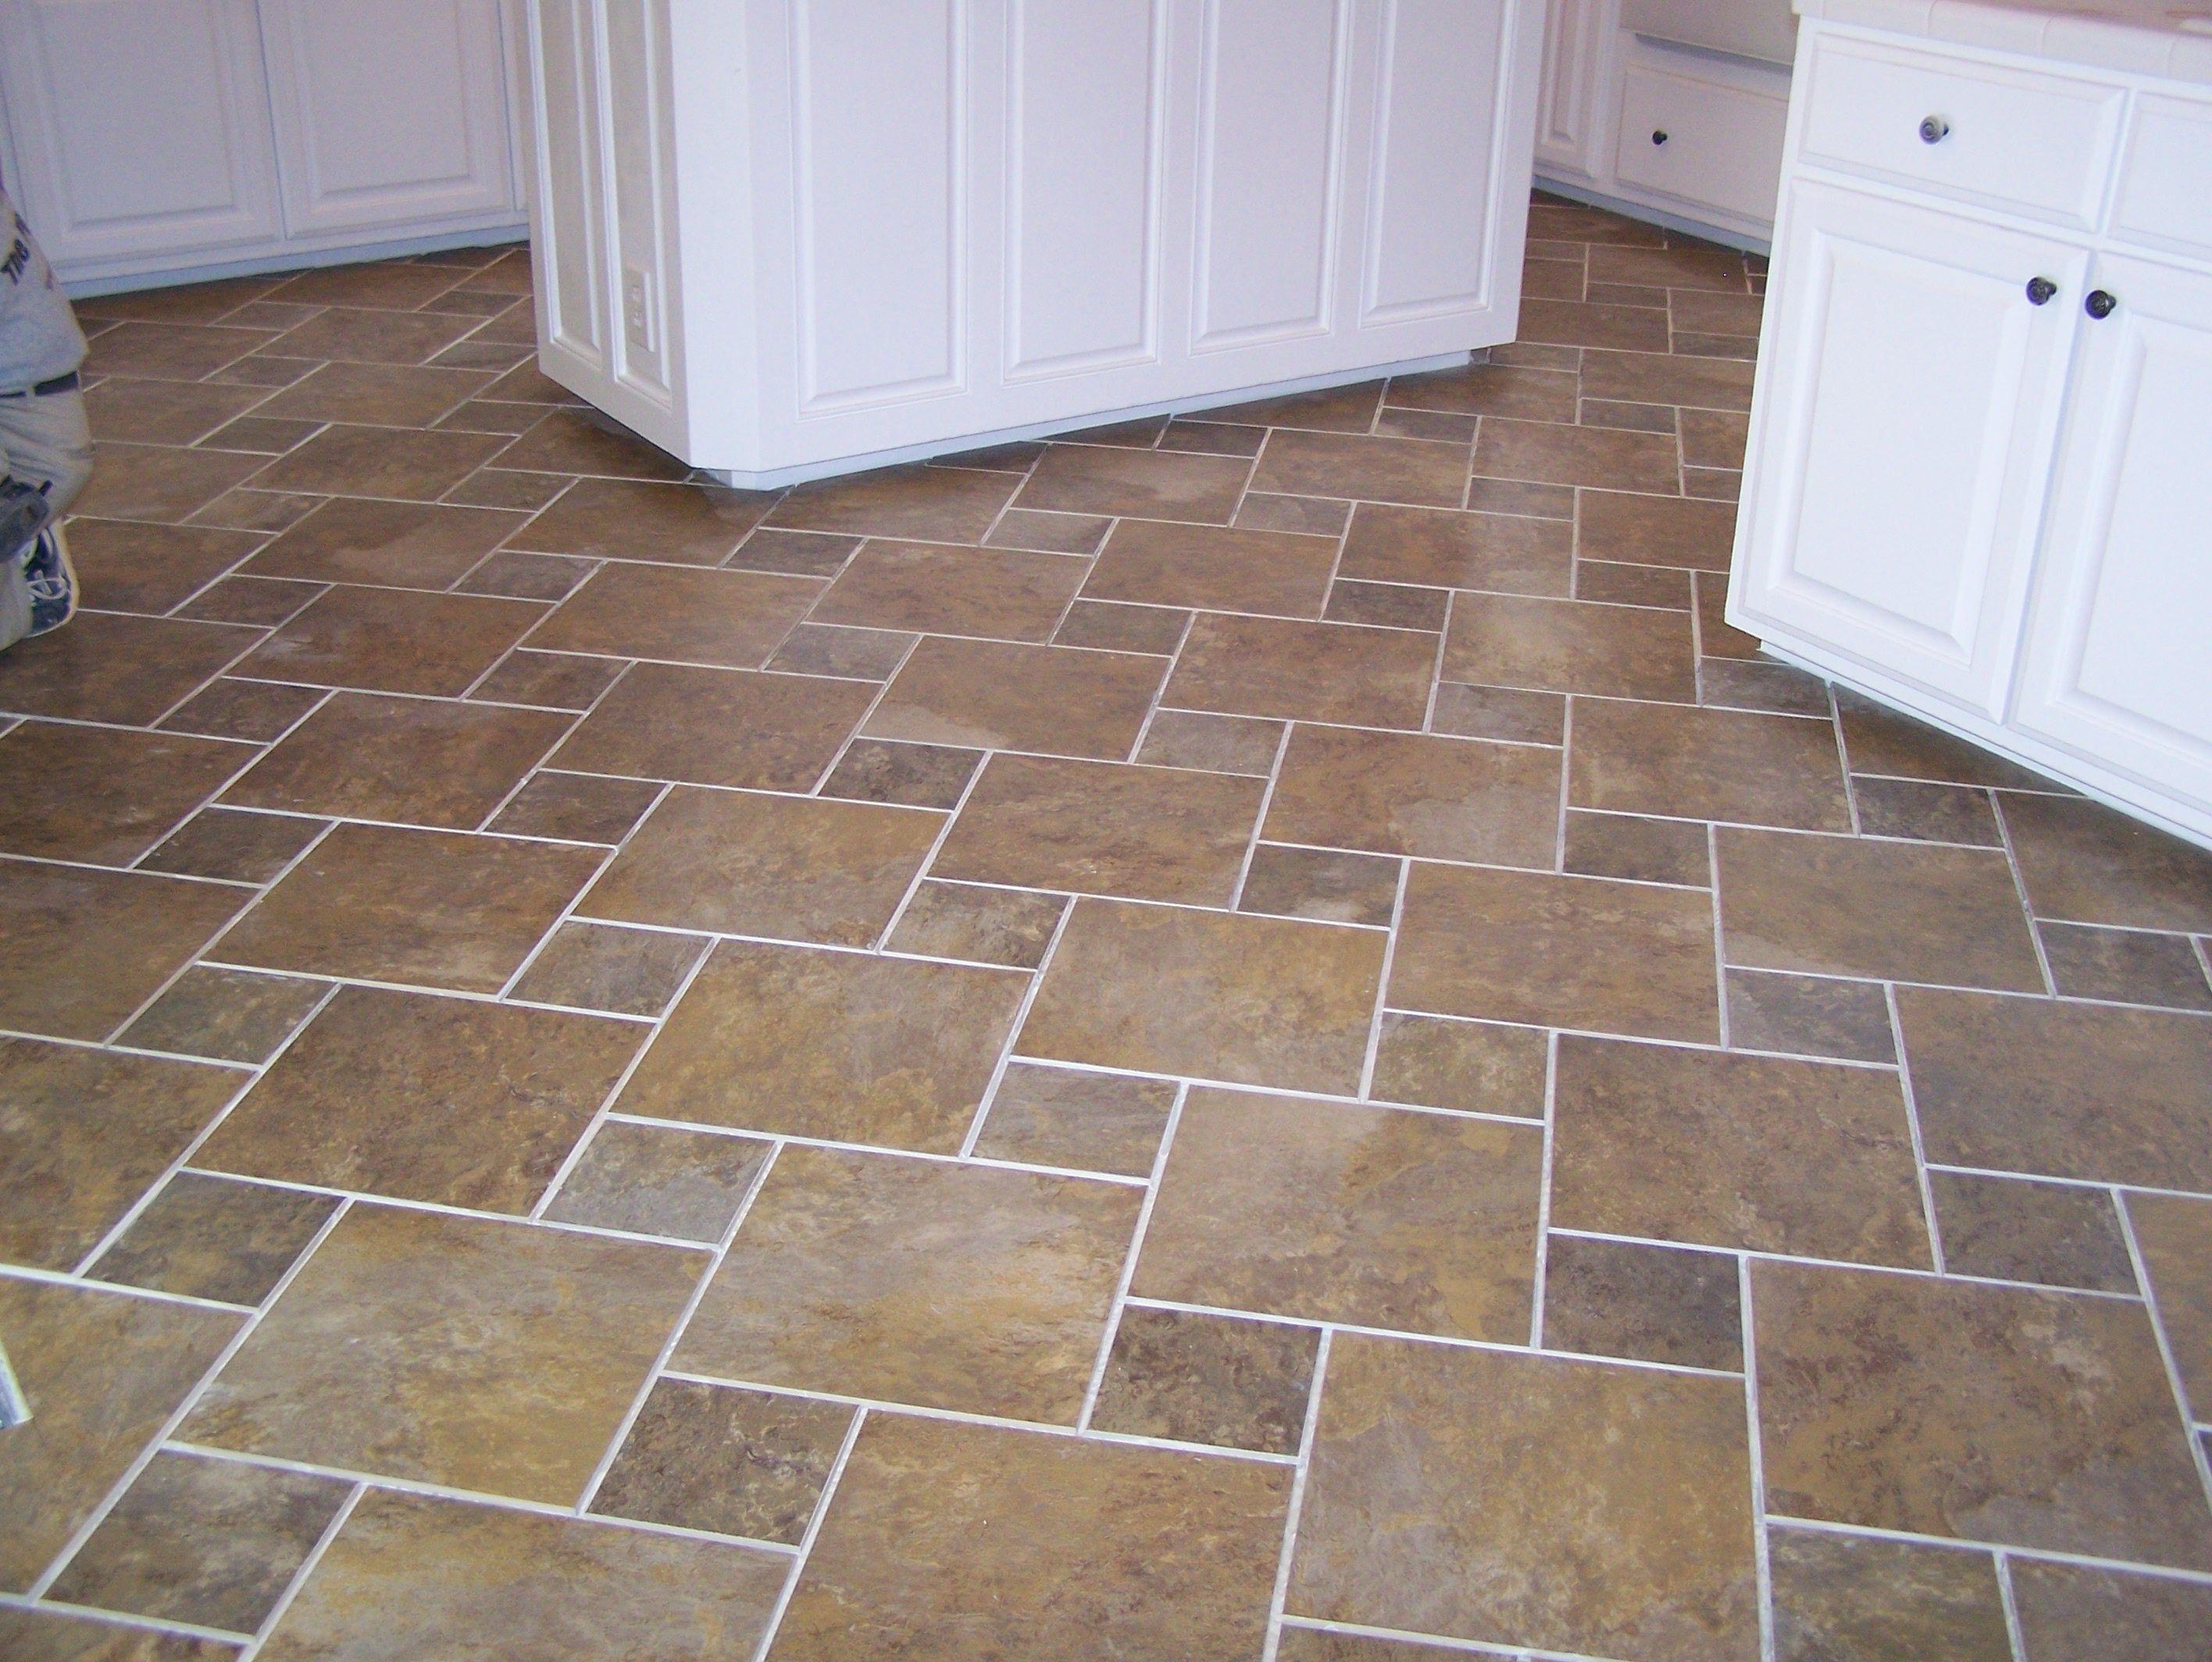 Ceramic tile floor pattern ideas httpviajesairmar ceramic tile floor pattern ideas dailygadgetfo Gallery